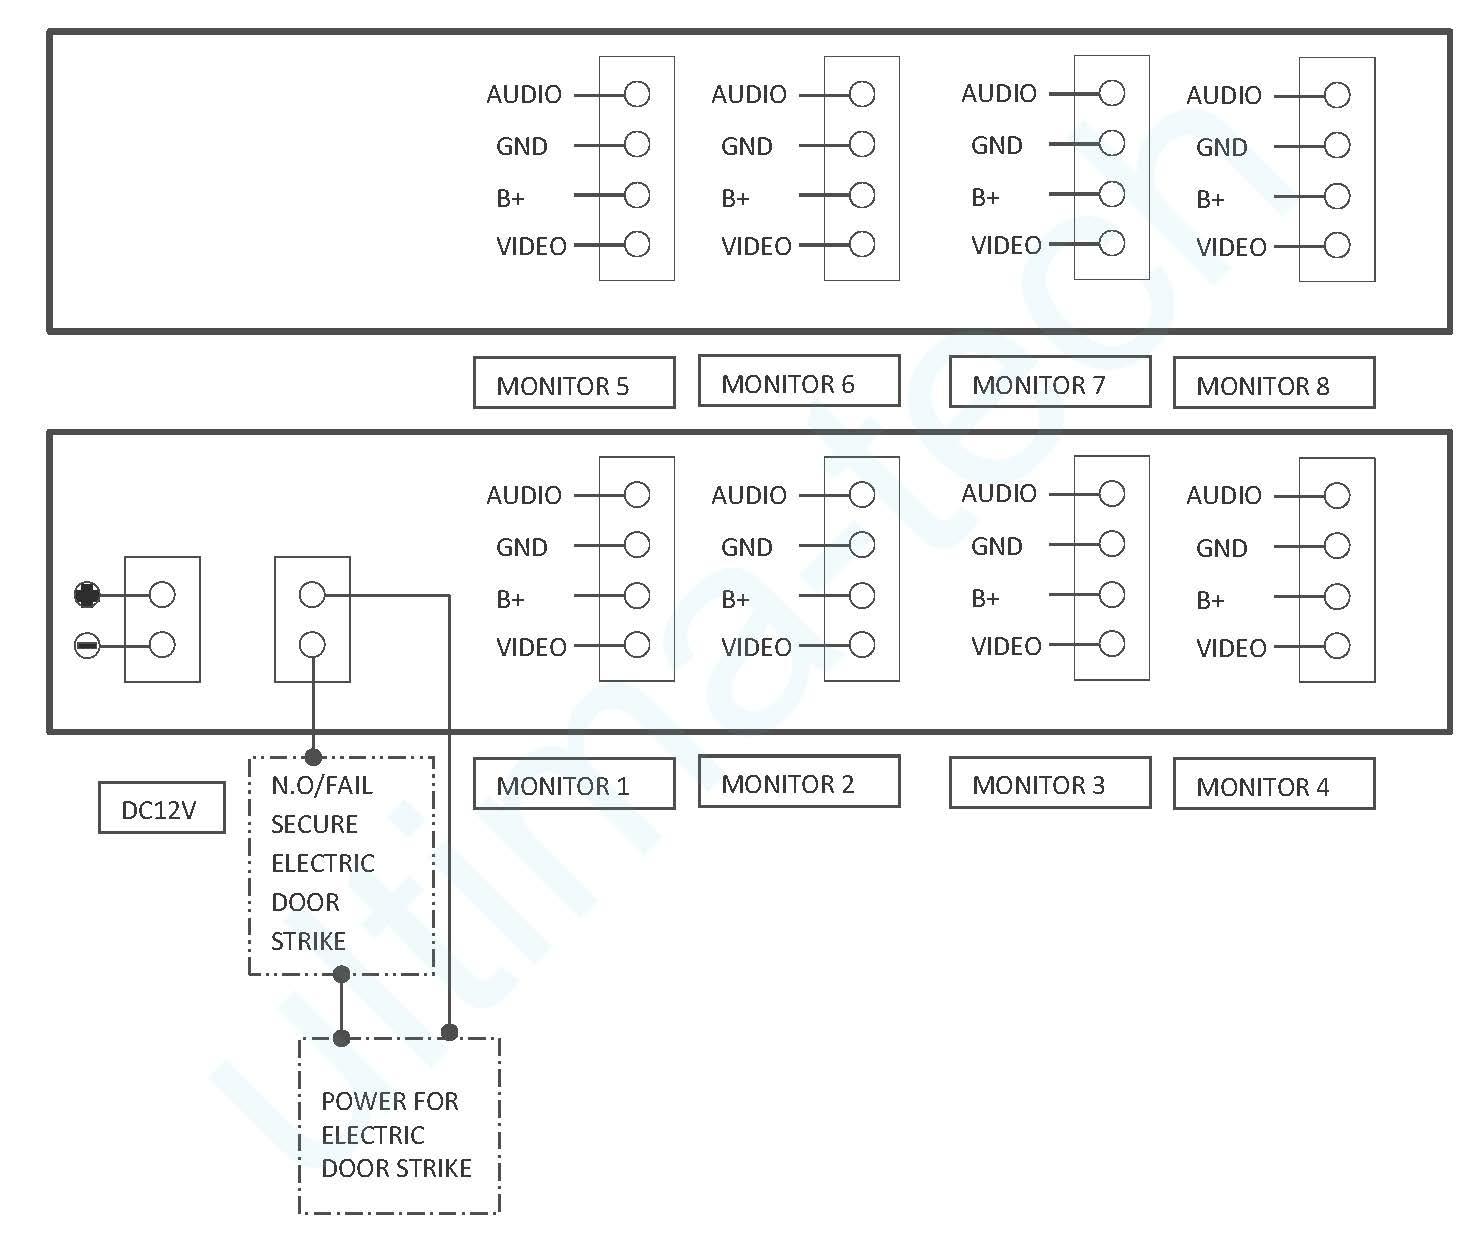 comelit wiring diagram 12v air compressor diagrams friendship bracelet